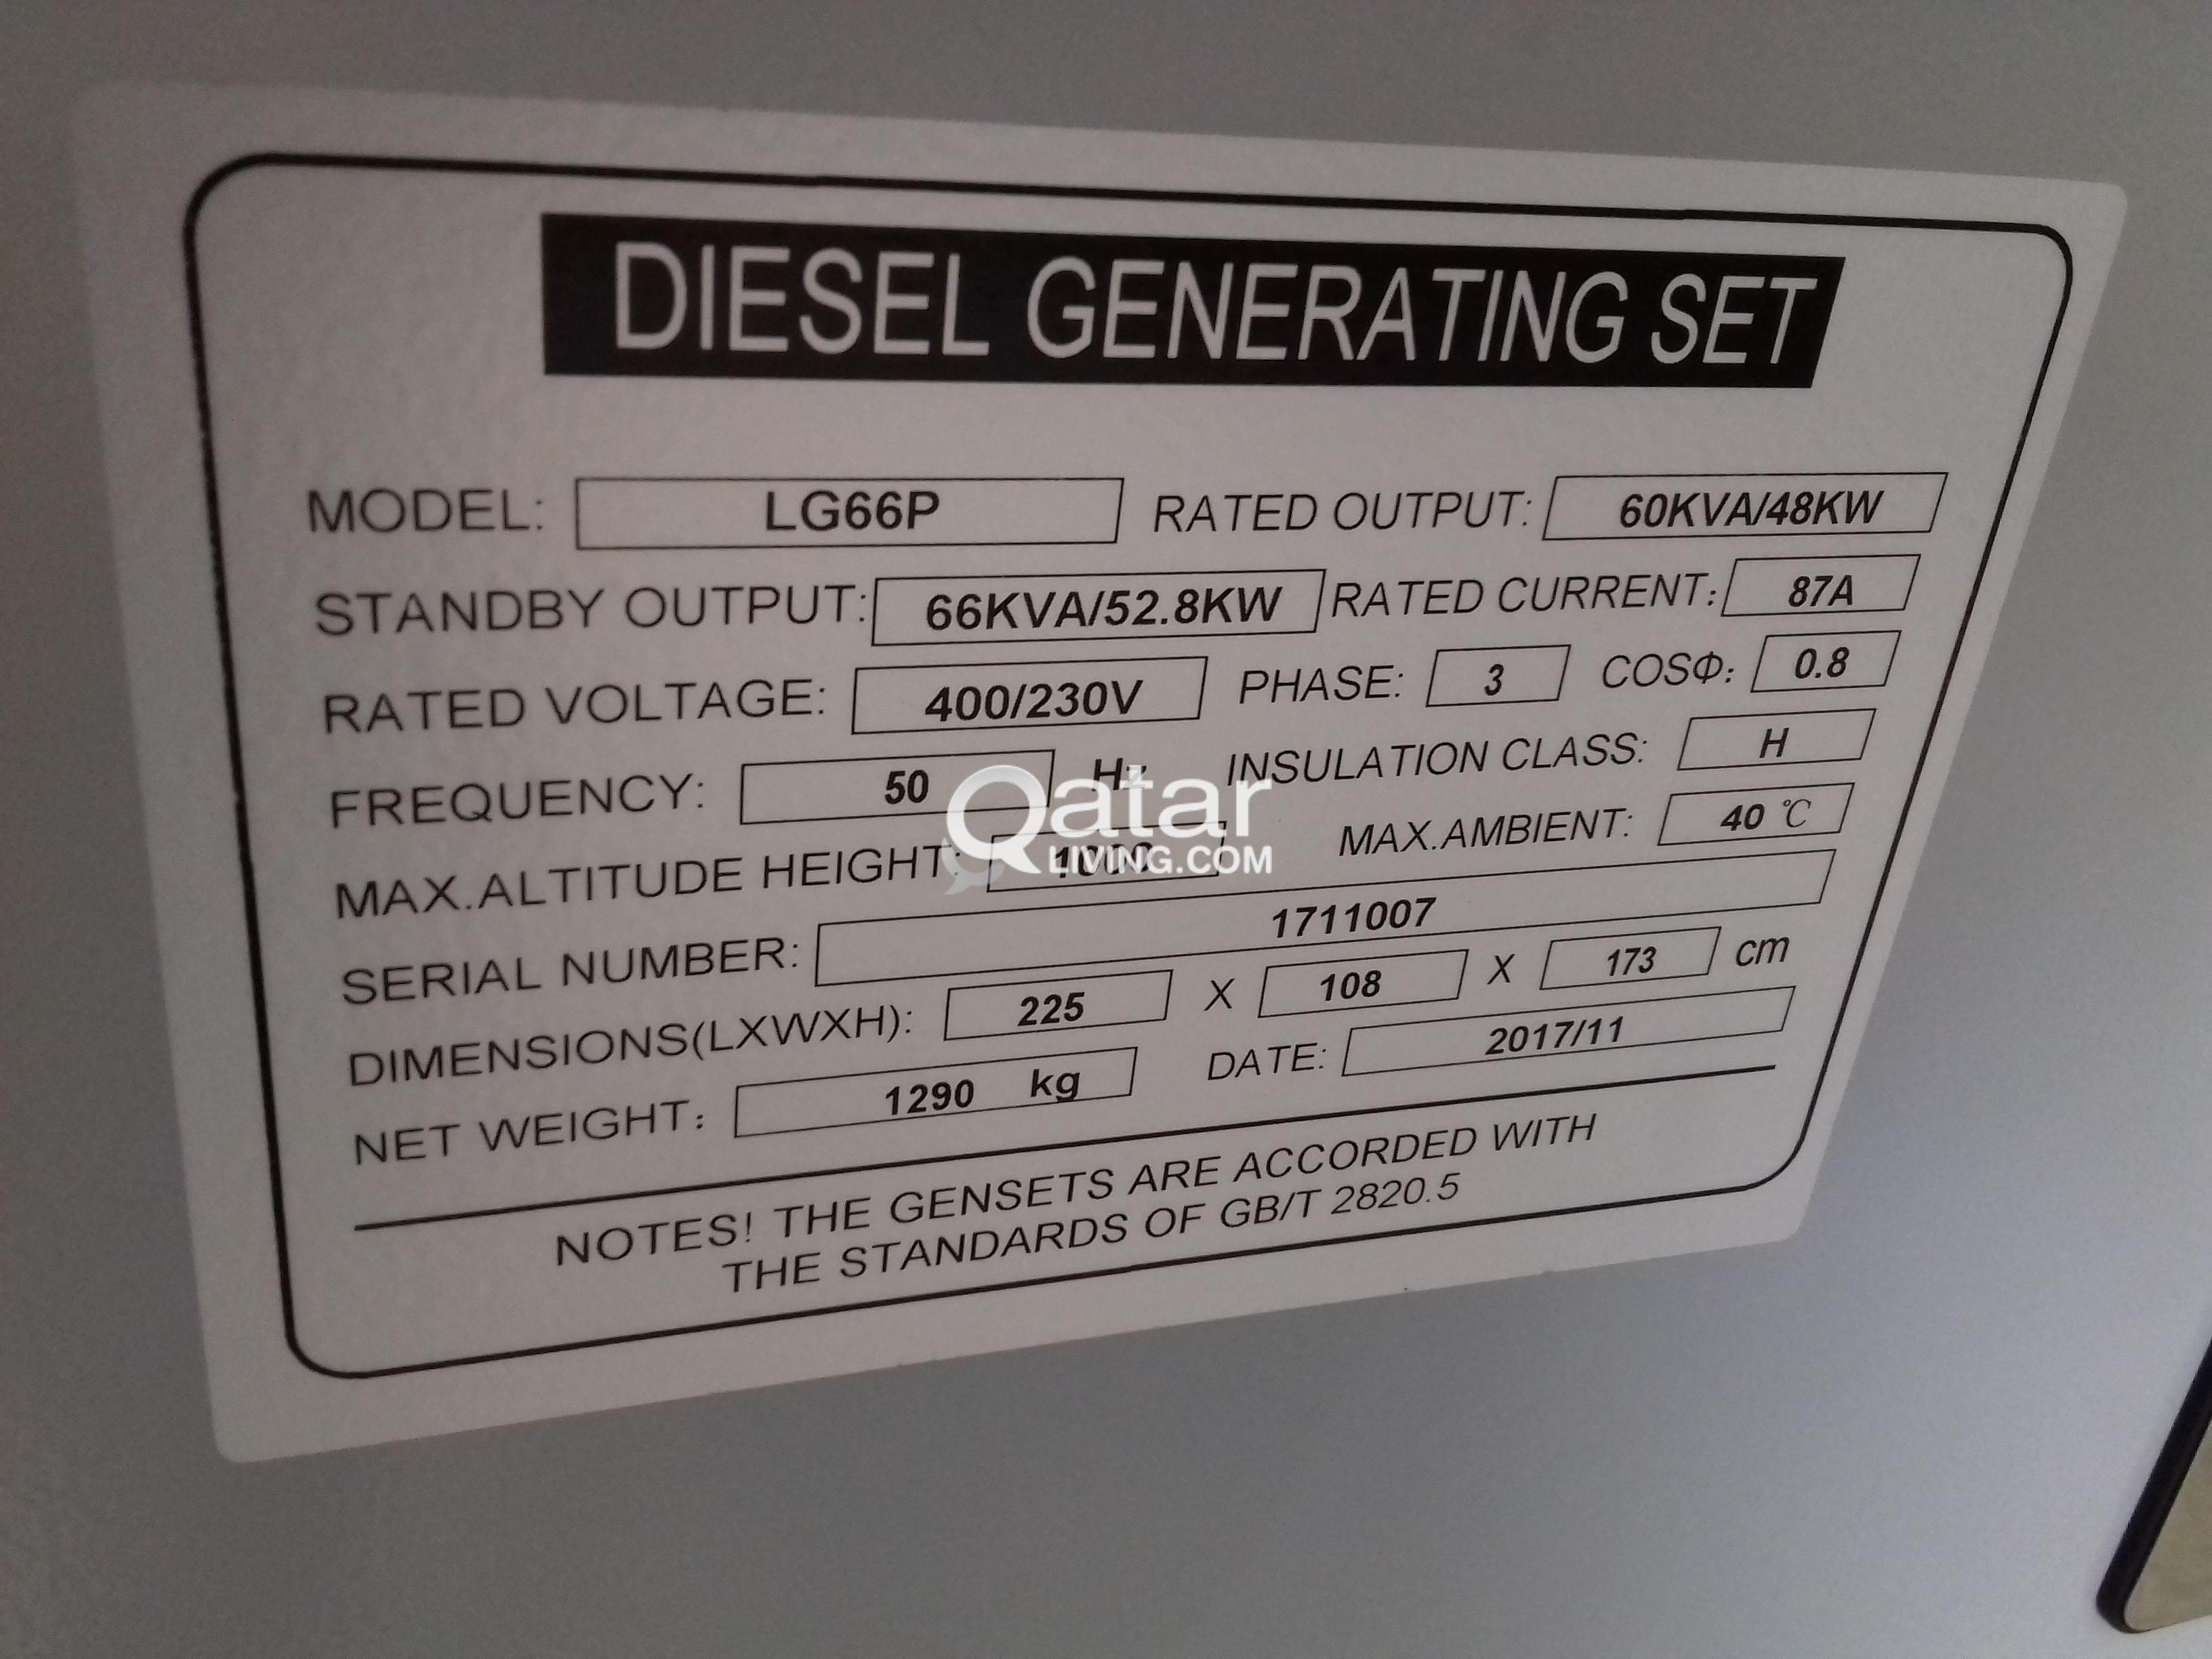 60kva Generator for sale | Qatar Living